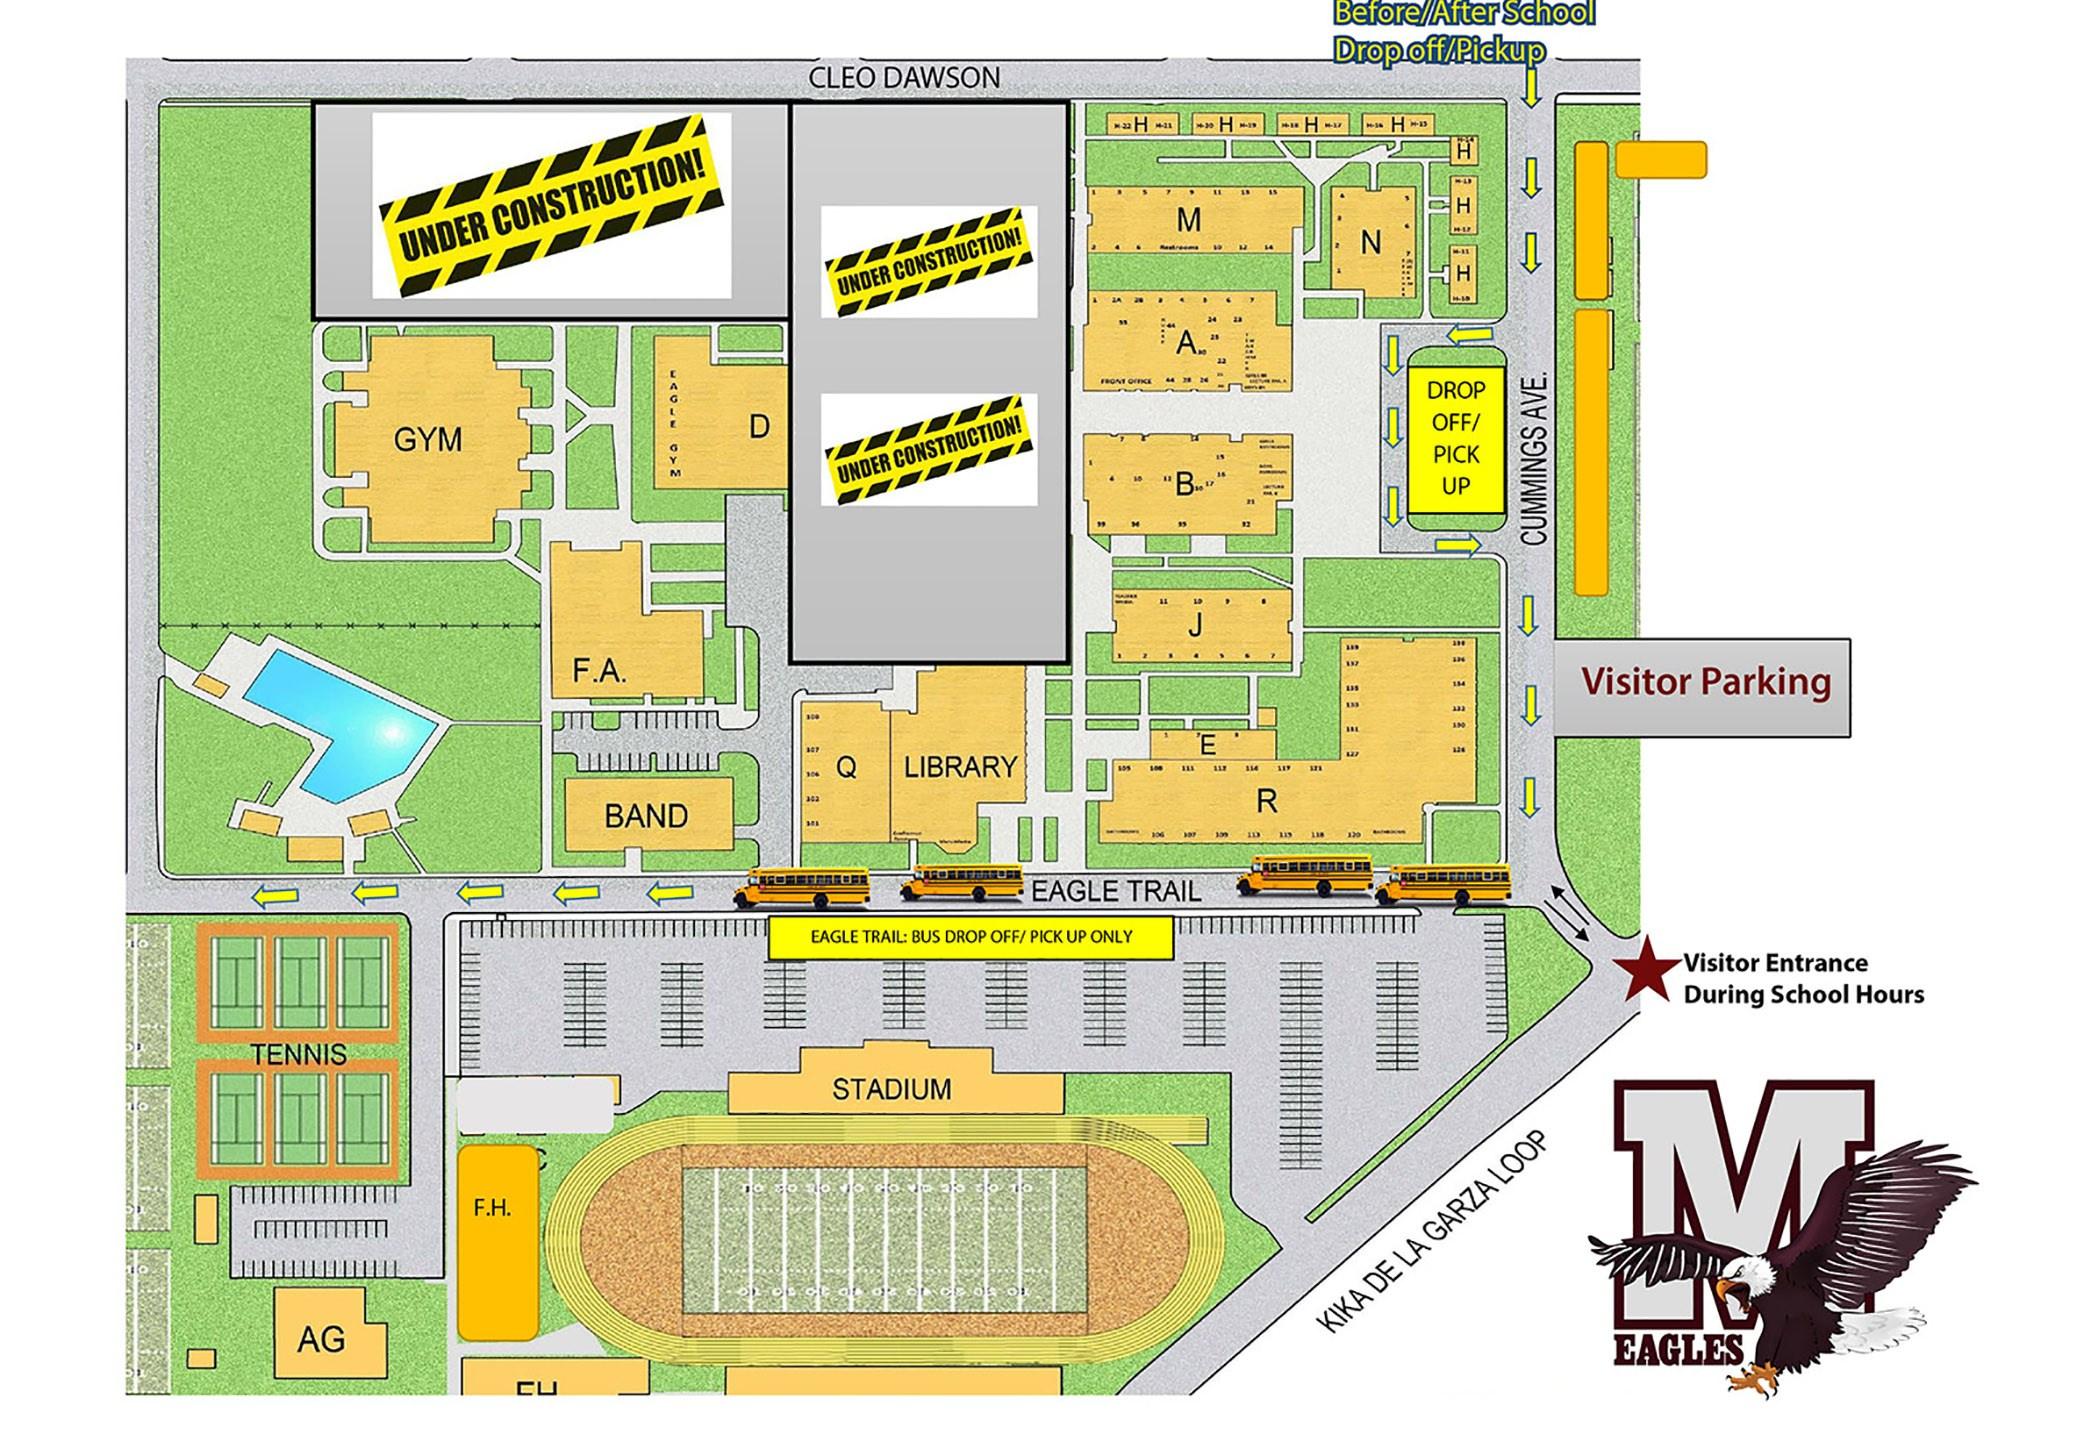 MHS Access Graphic_1439816269895.jpg